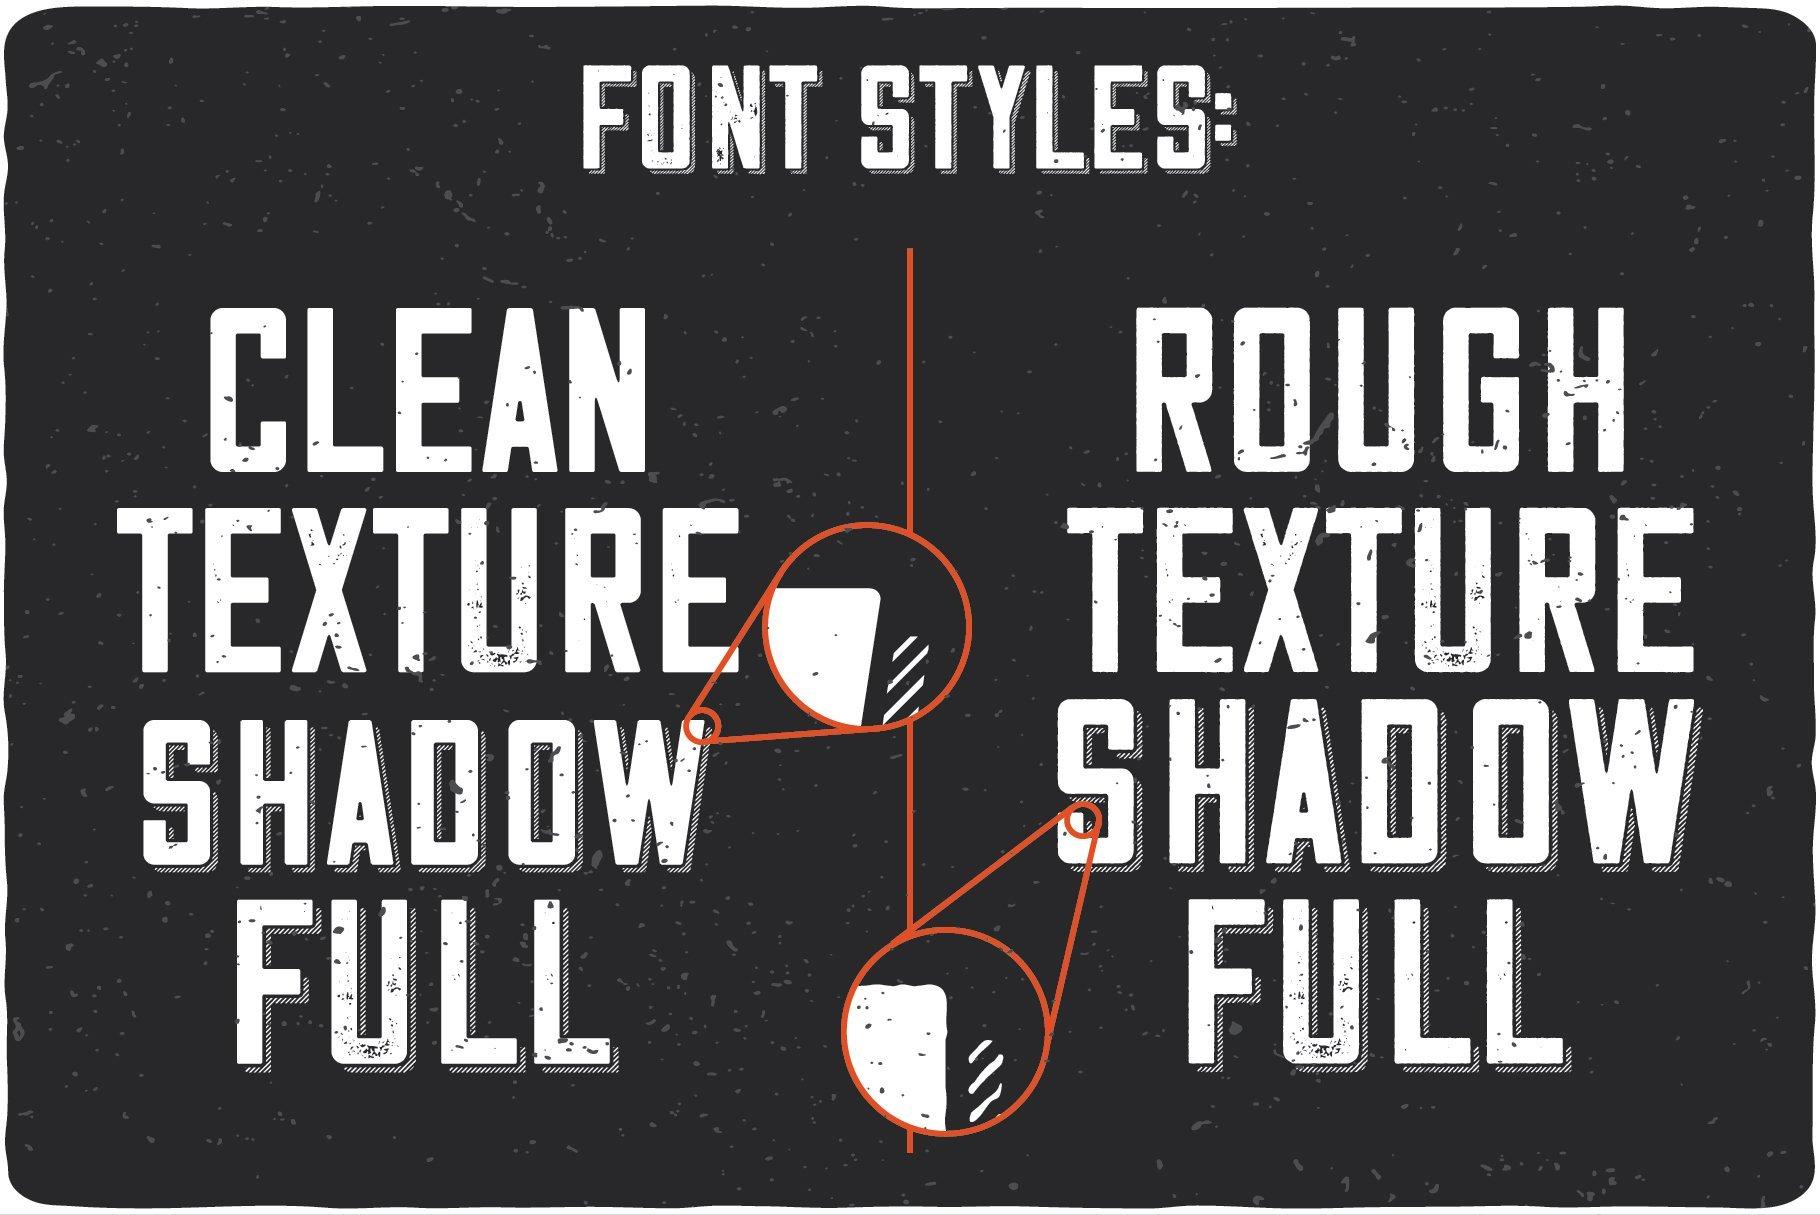 White on black font styles.